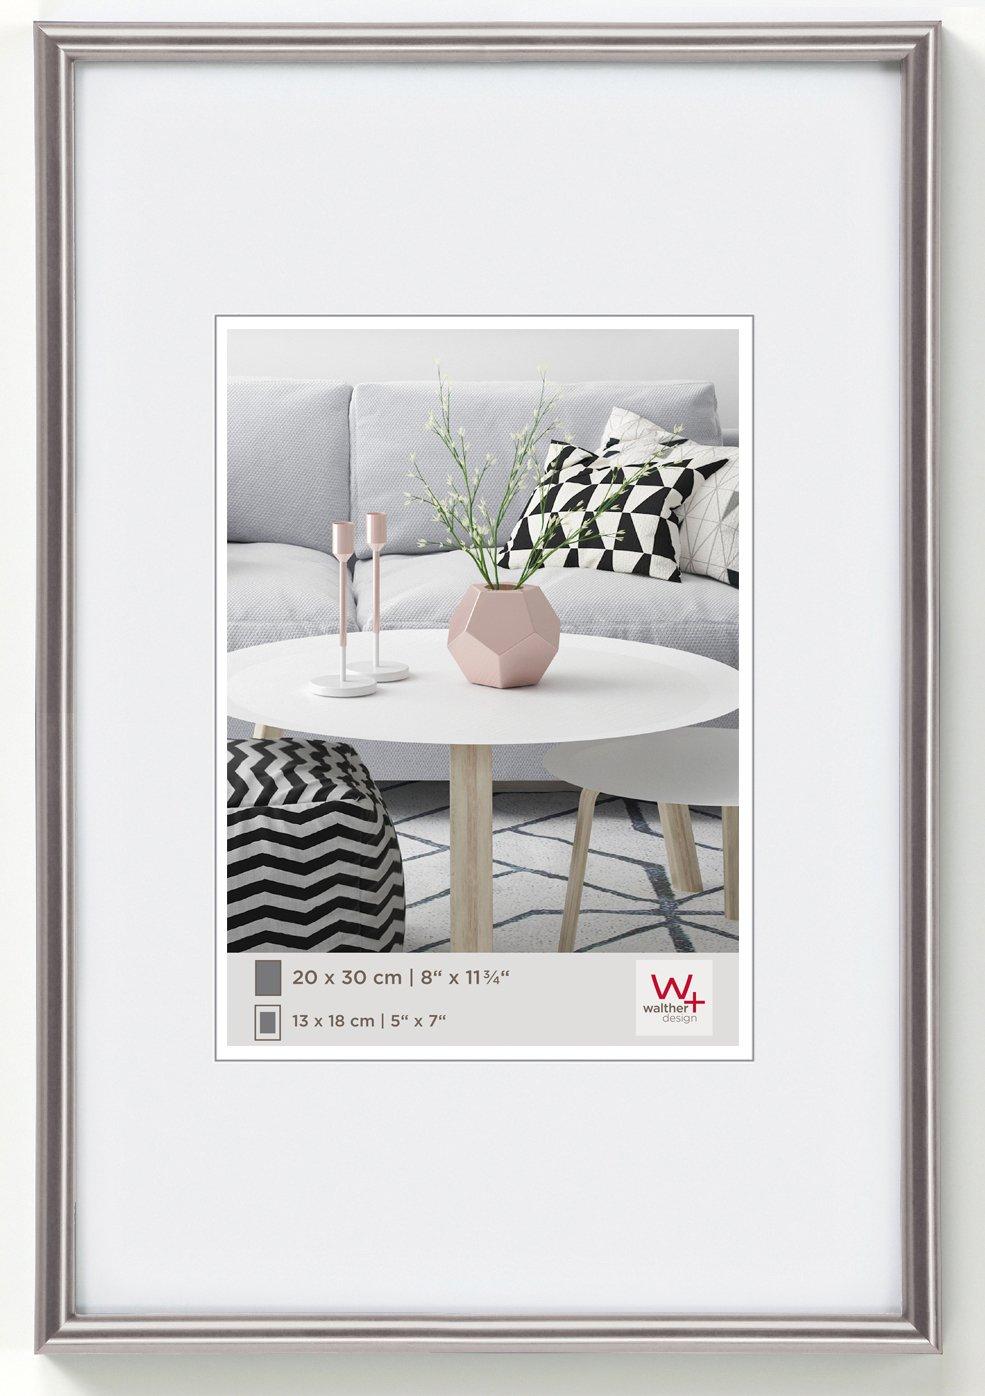 Amazon.de: Walther KD045H Galeria Kunststoffrahmen im Format 30 x 45 ...